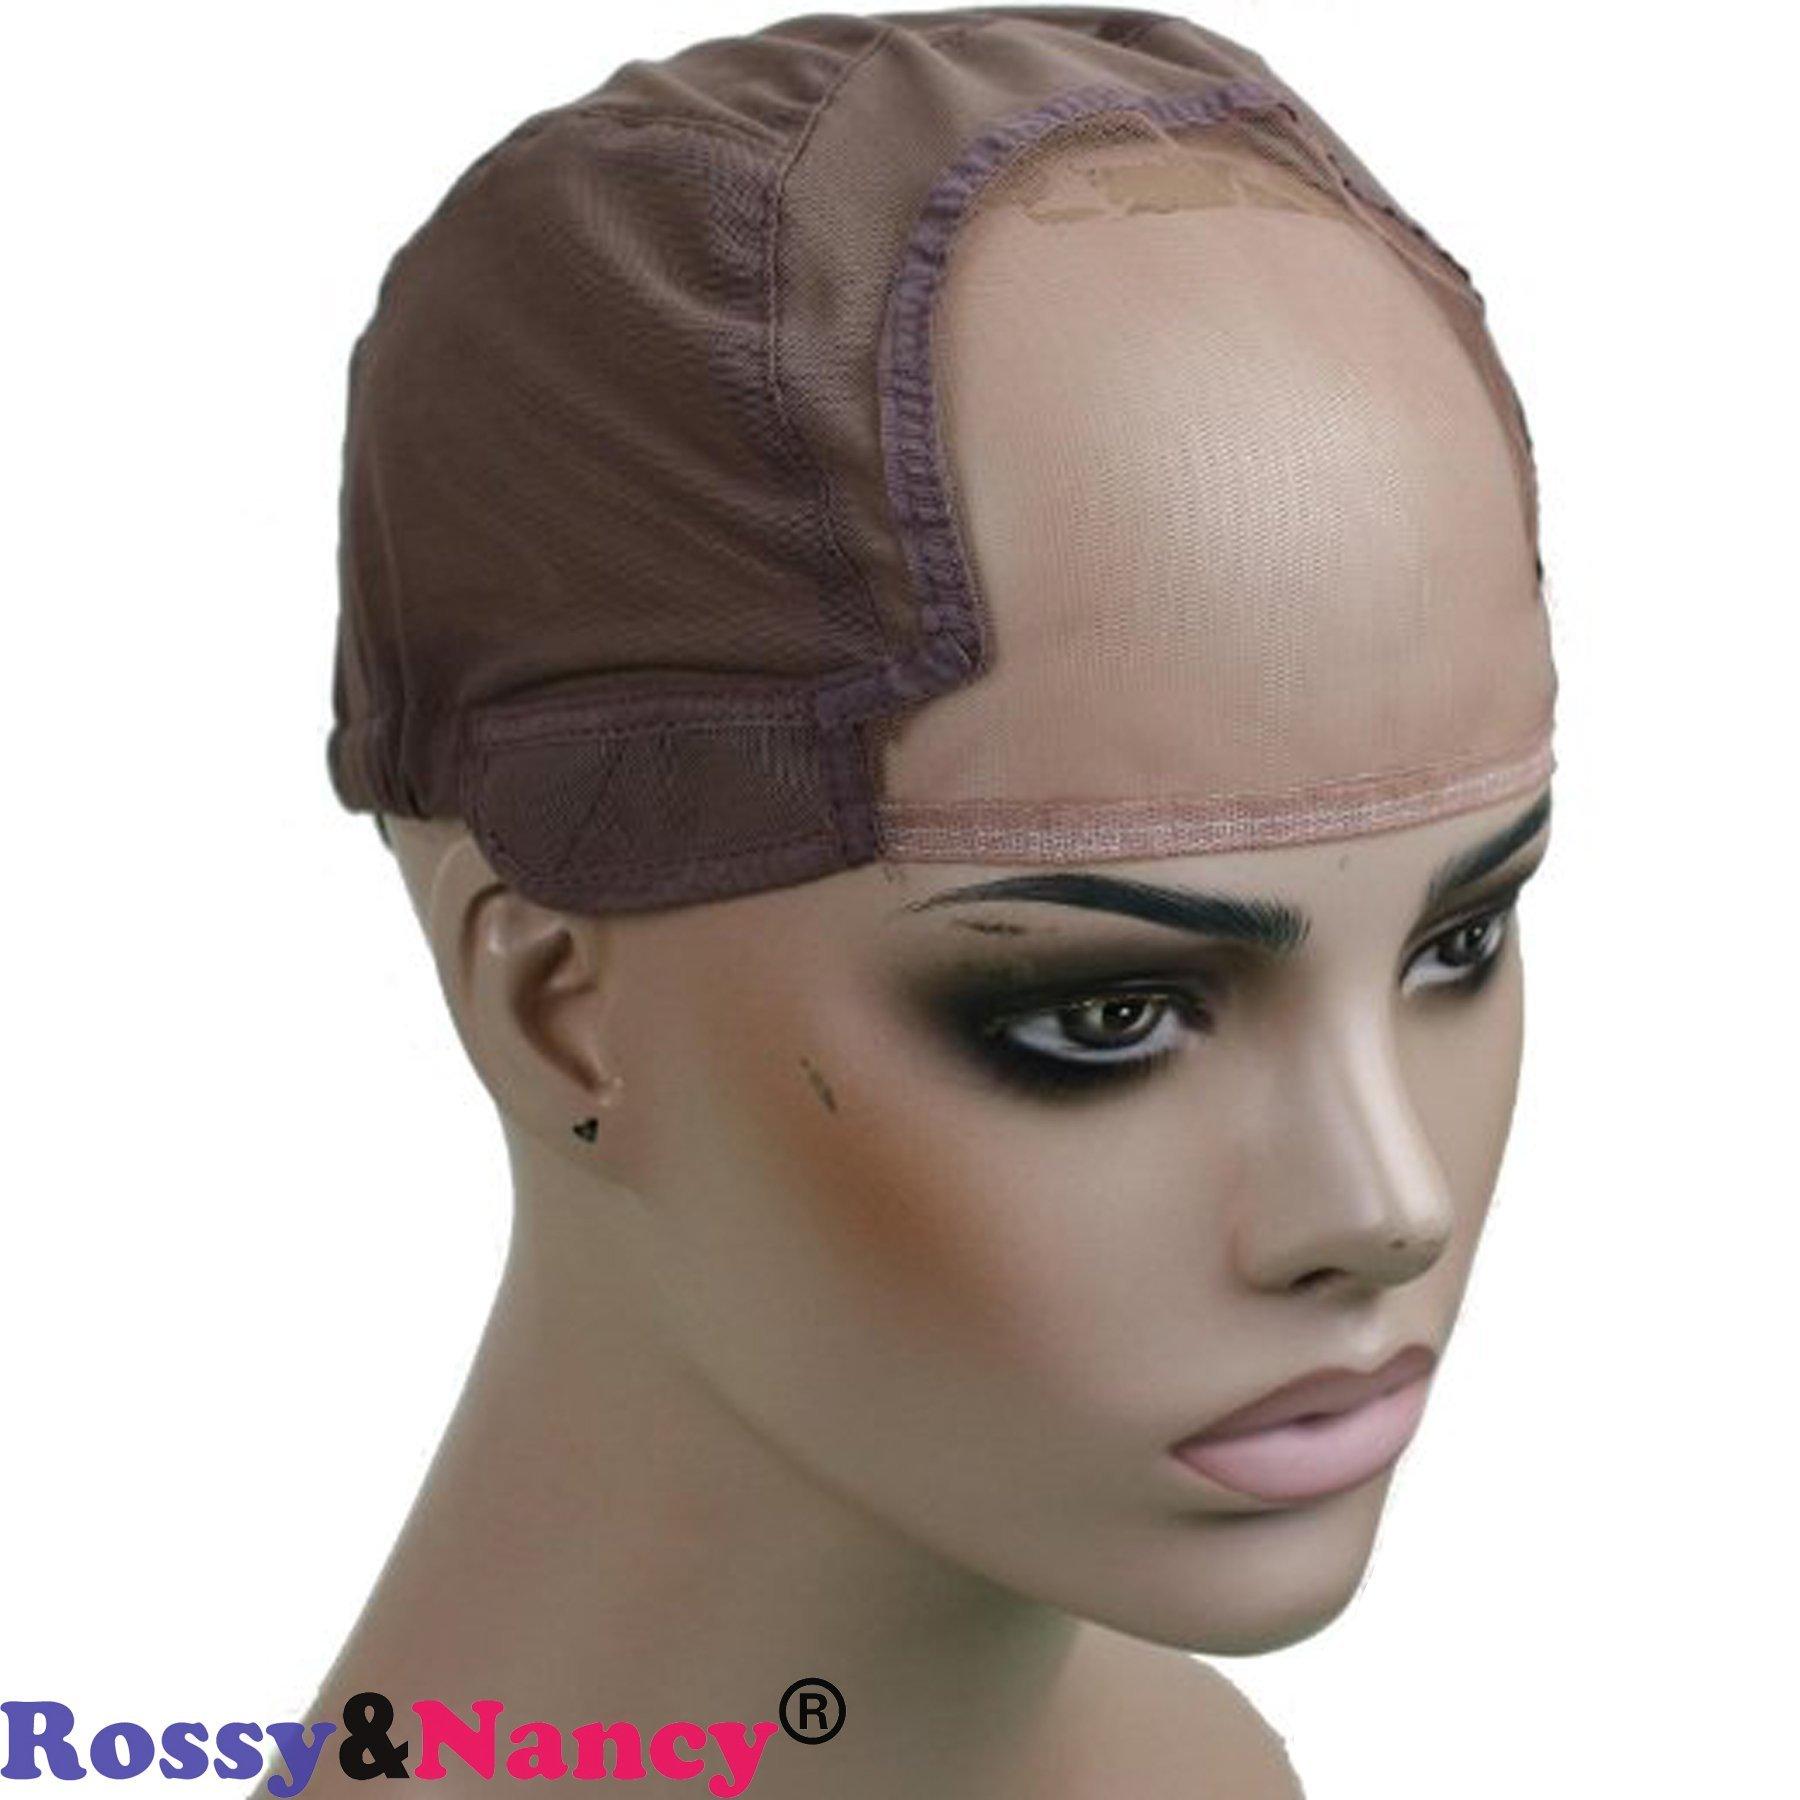 Rossy&Nancy Best Gluess Silk Swiss Lace Net Ear to ear stretch wig caps with adjustable straps for making Wigs by Rossy&Nancy